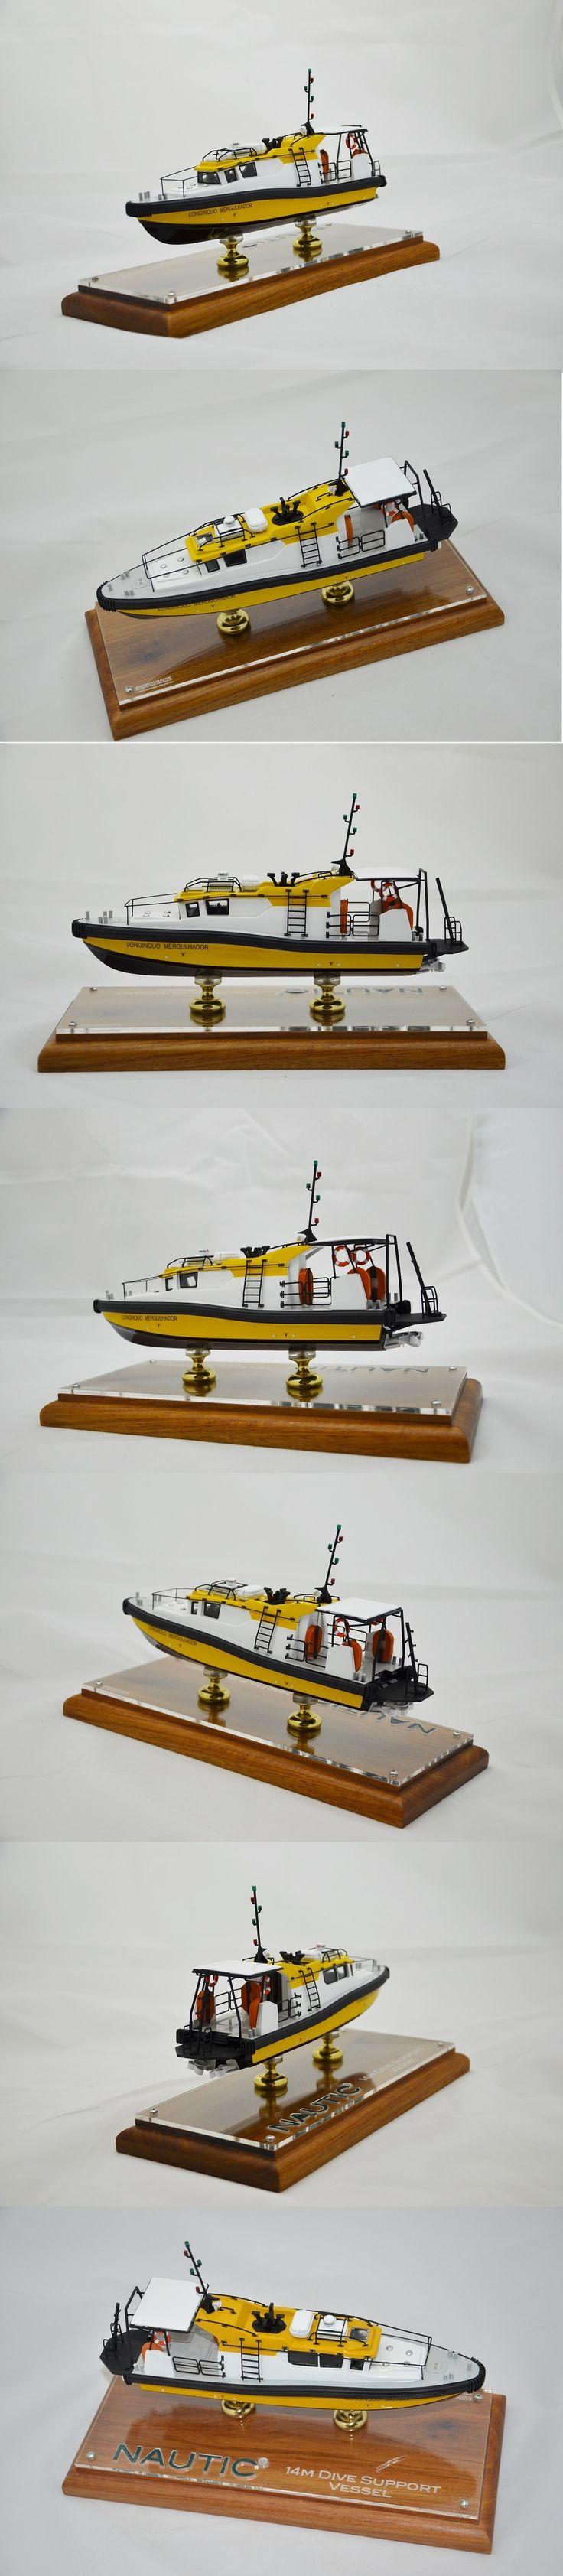 14M Diving Support Vessel #ScaleModel #LifeLike #AeroCreations